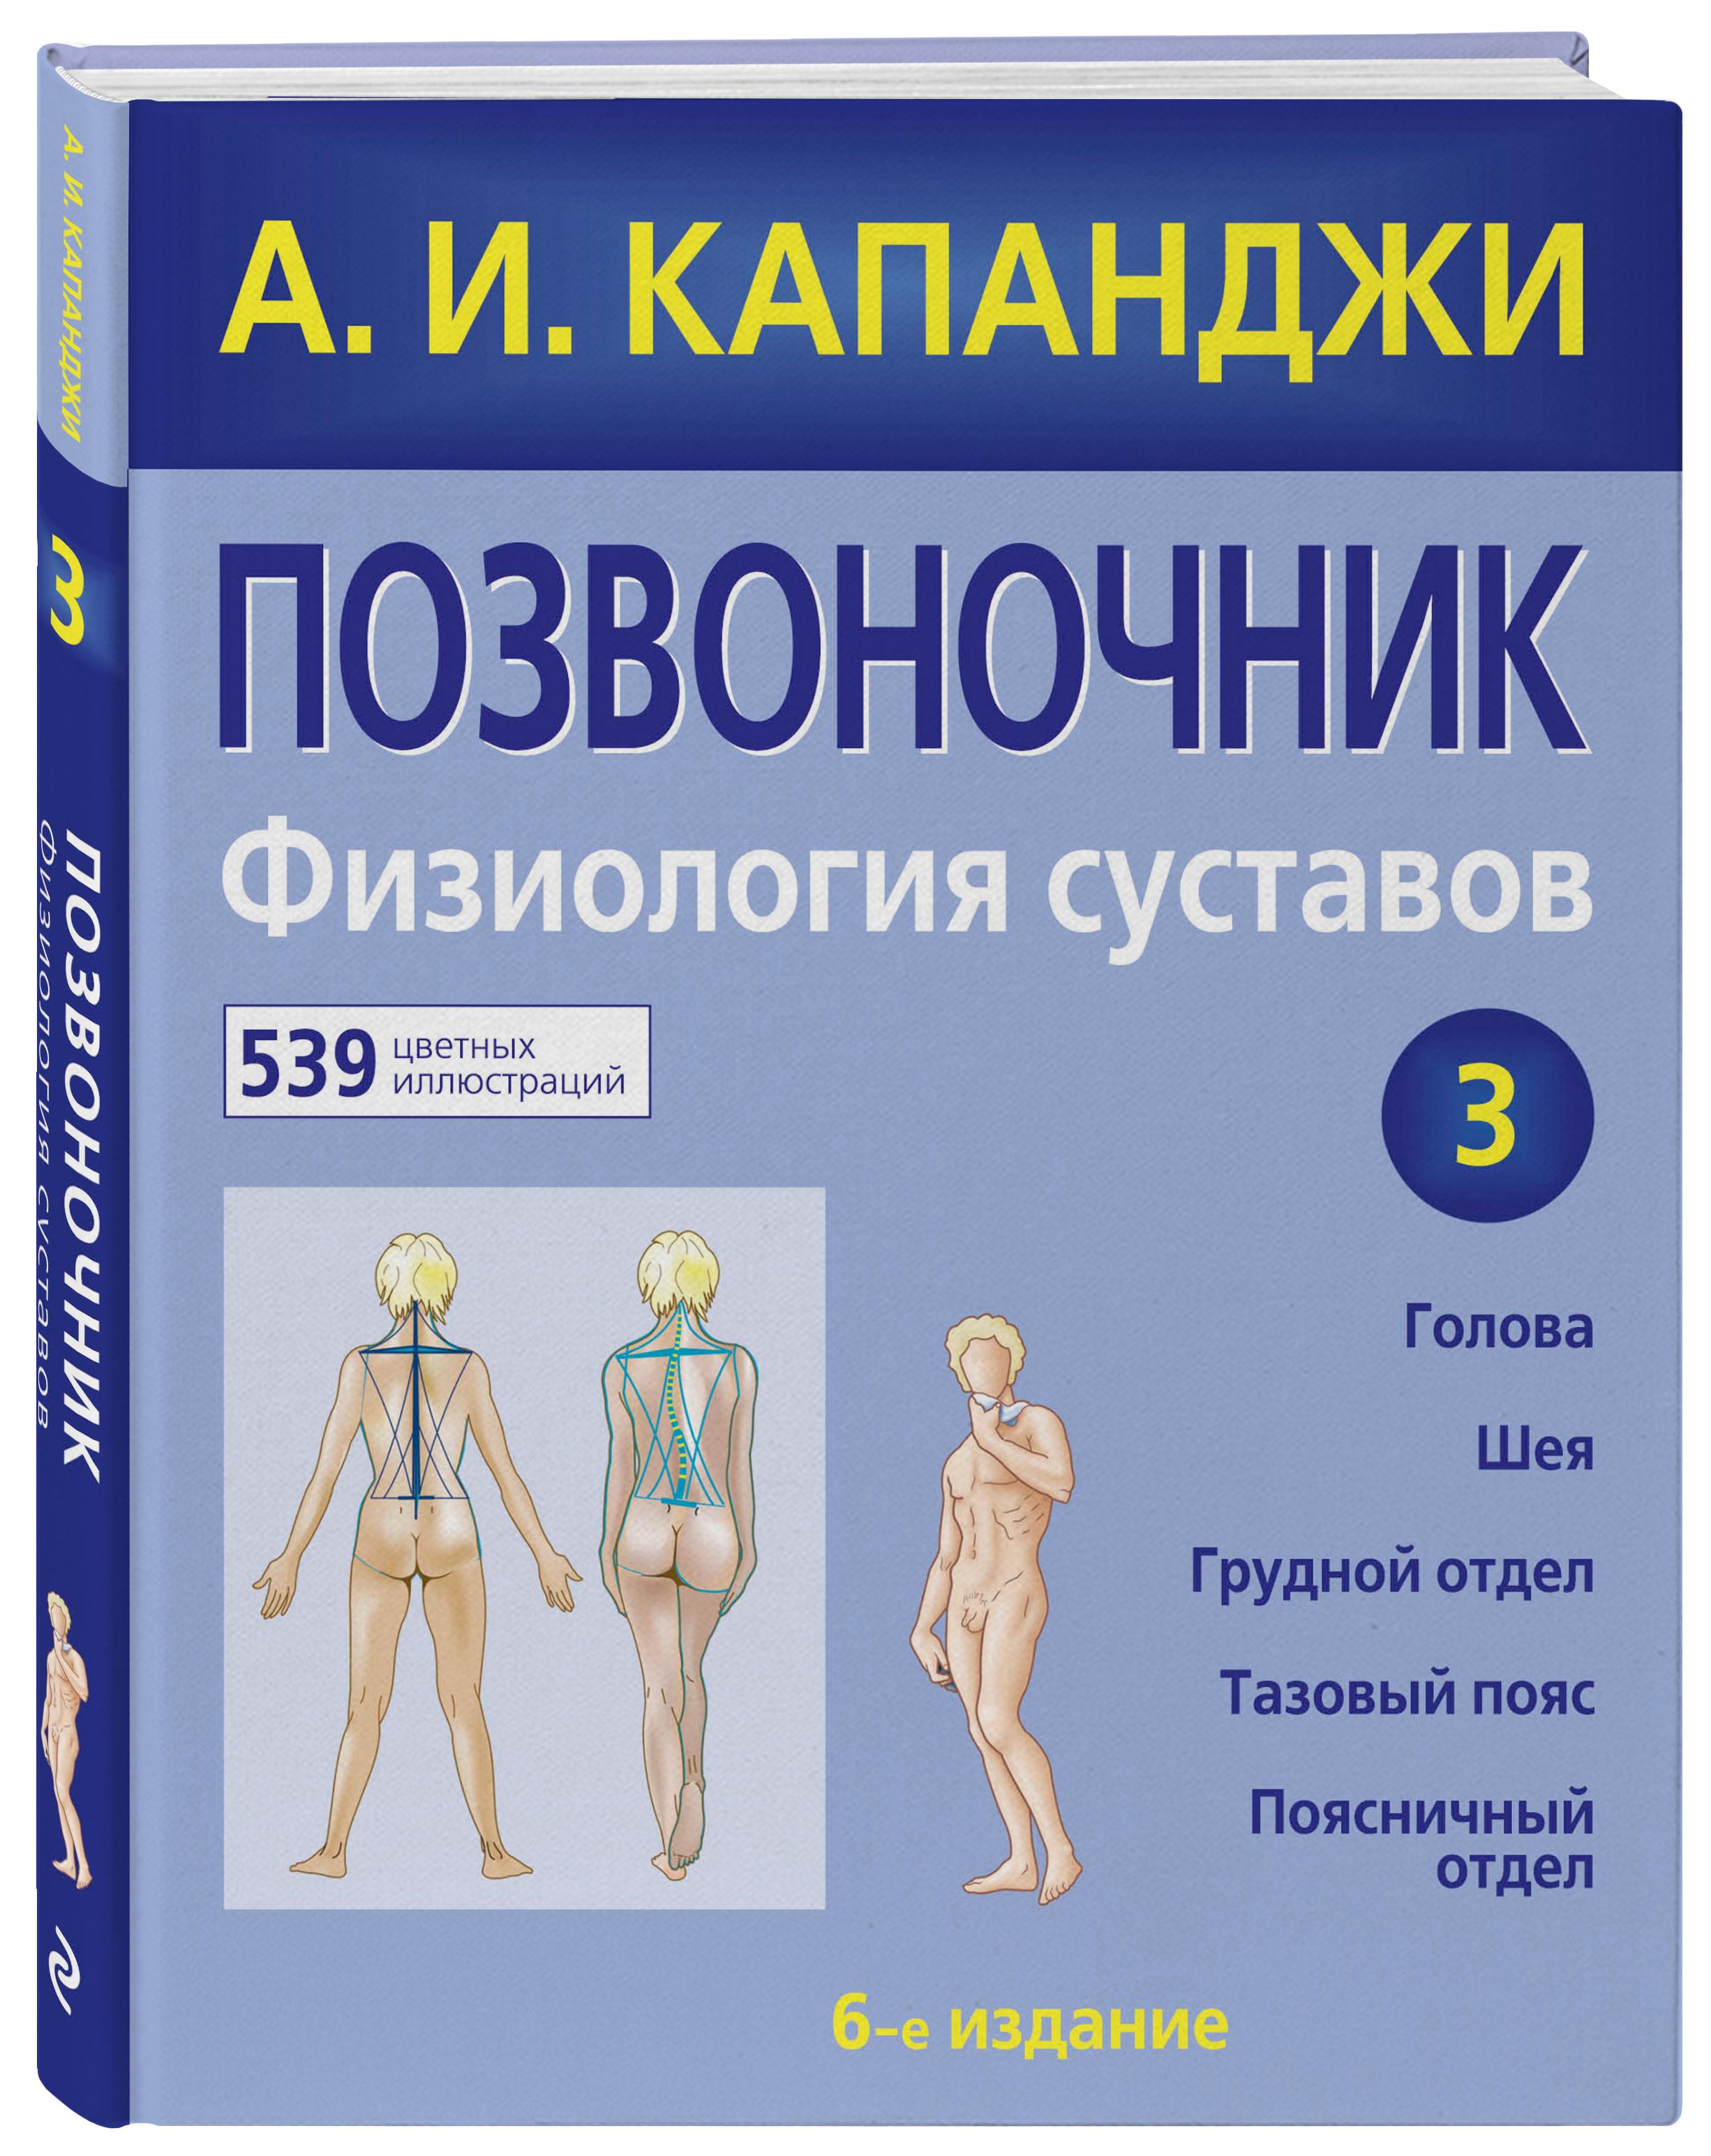 Позвоночник: Физиология суставов ( Капанджи А.И.  )